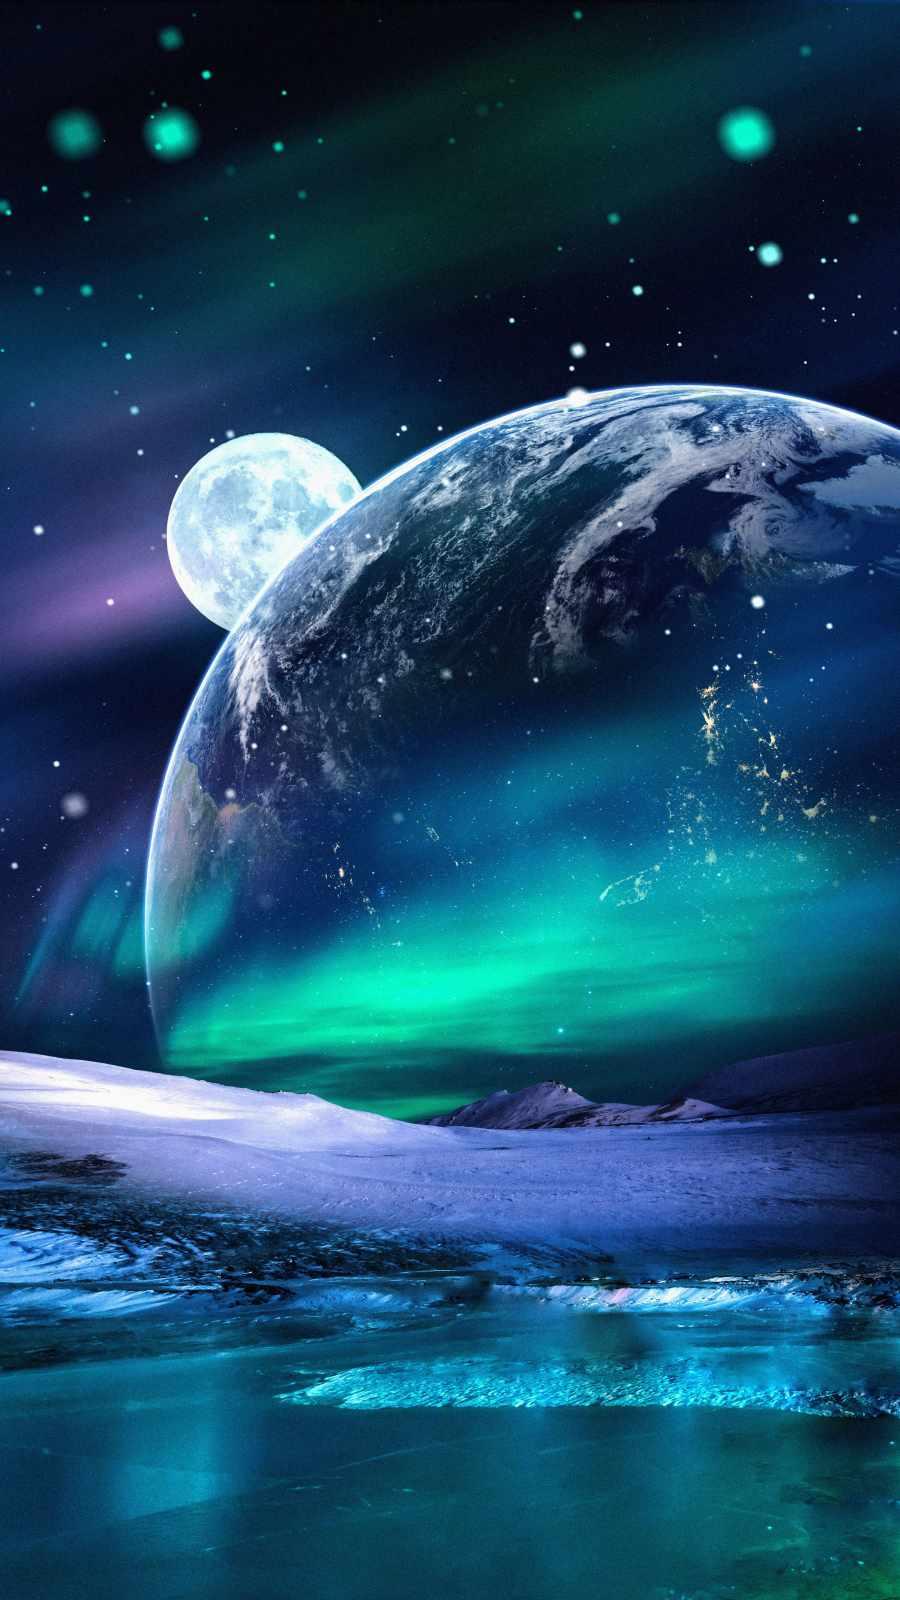 Space Aurora Lights Earth View